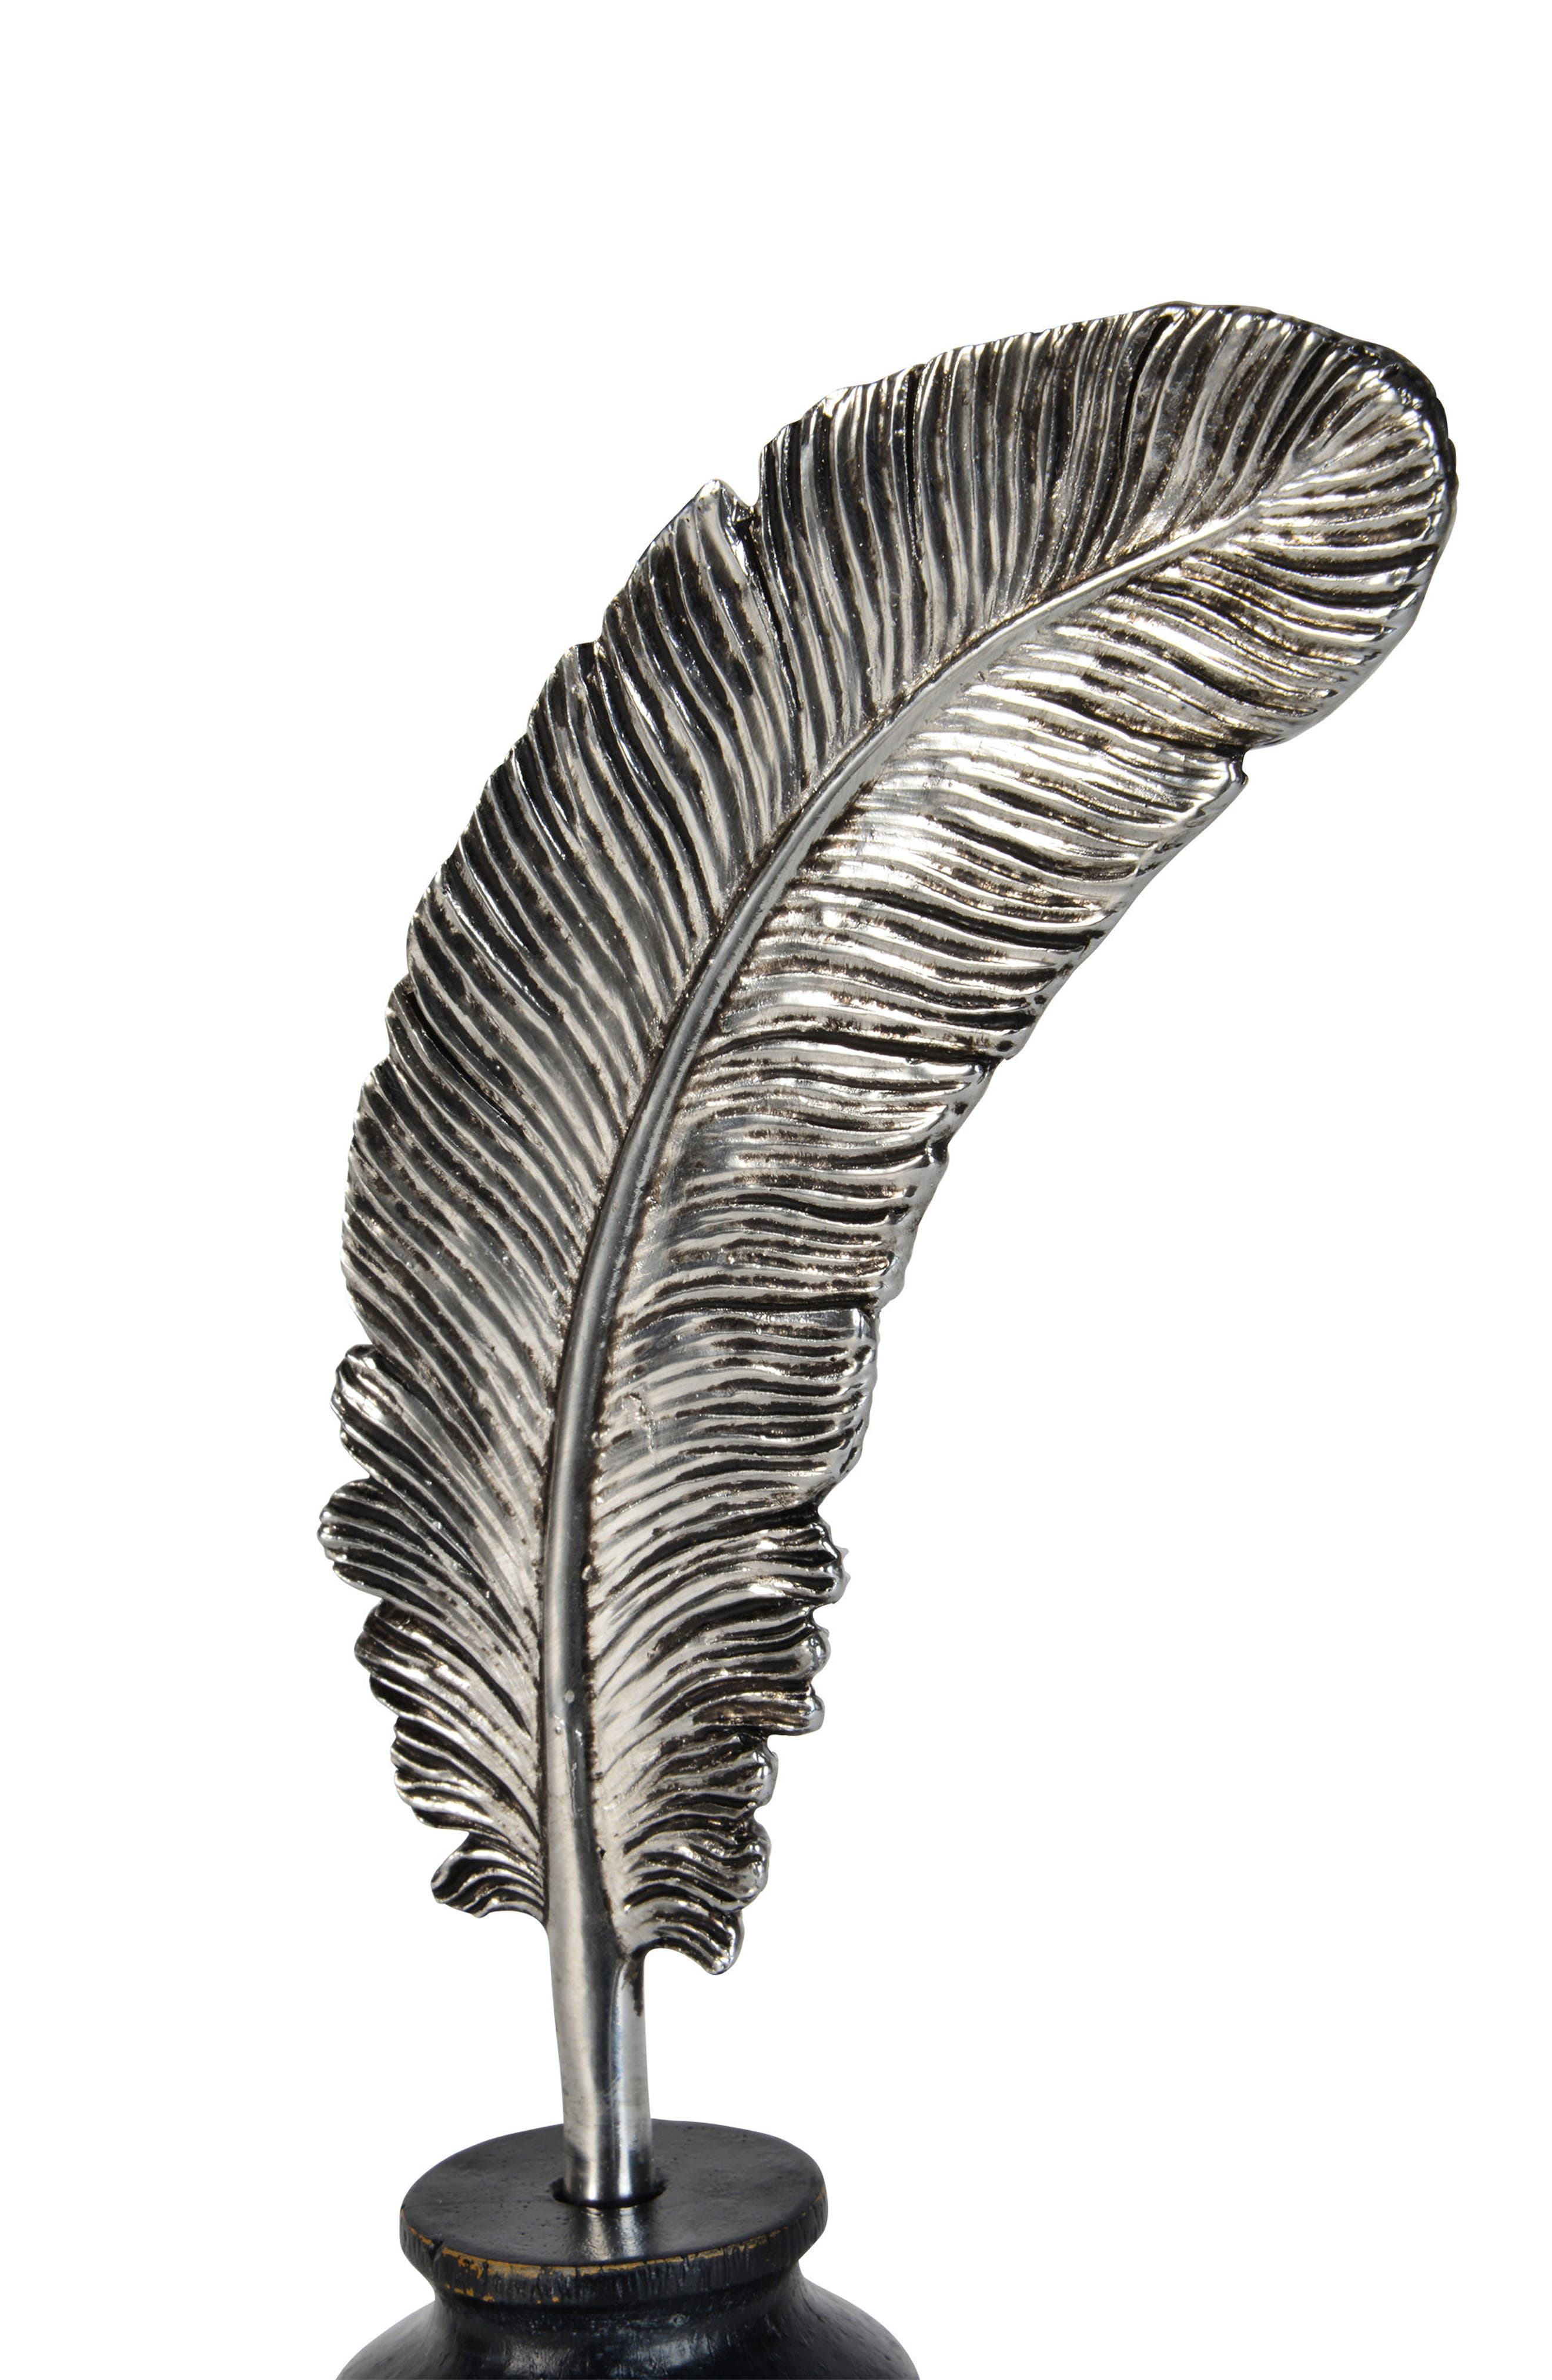 Calamus Statue,                             Alternate thumbnail 2, color,                             Antique Silver And Black